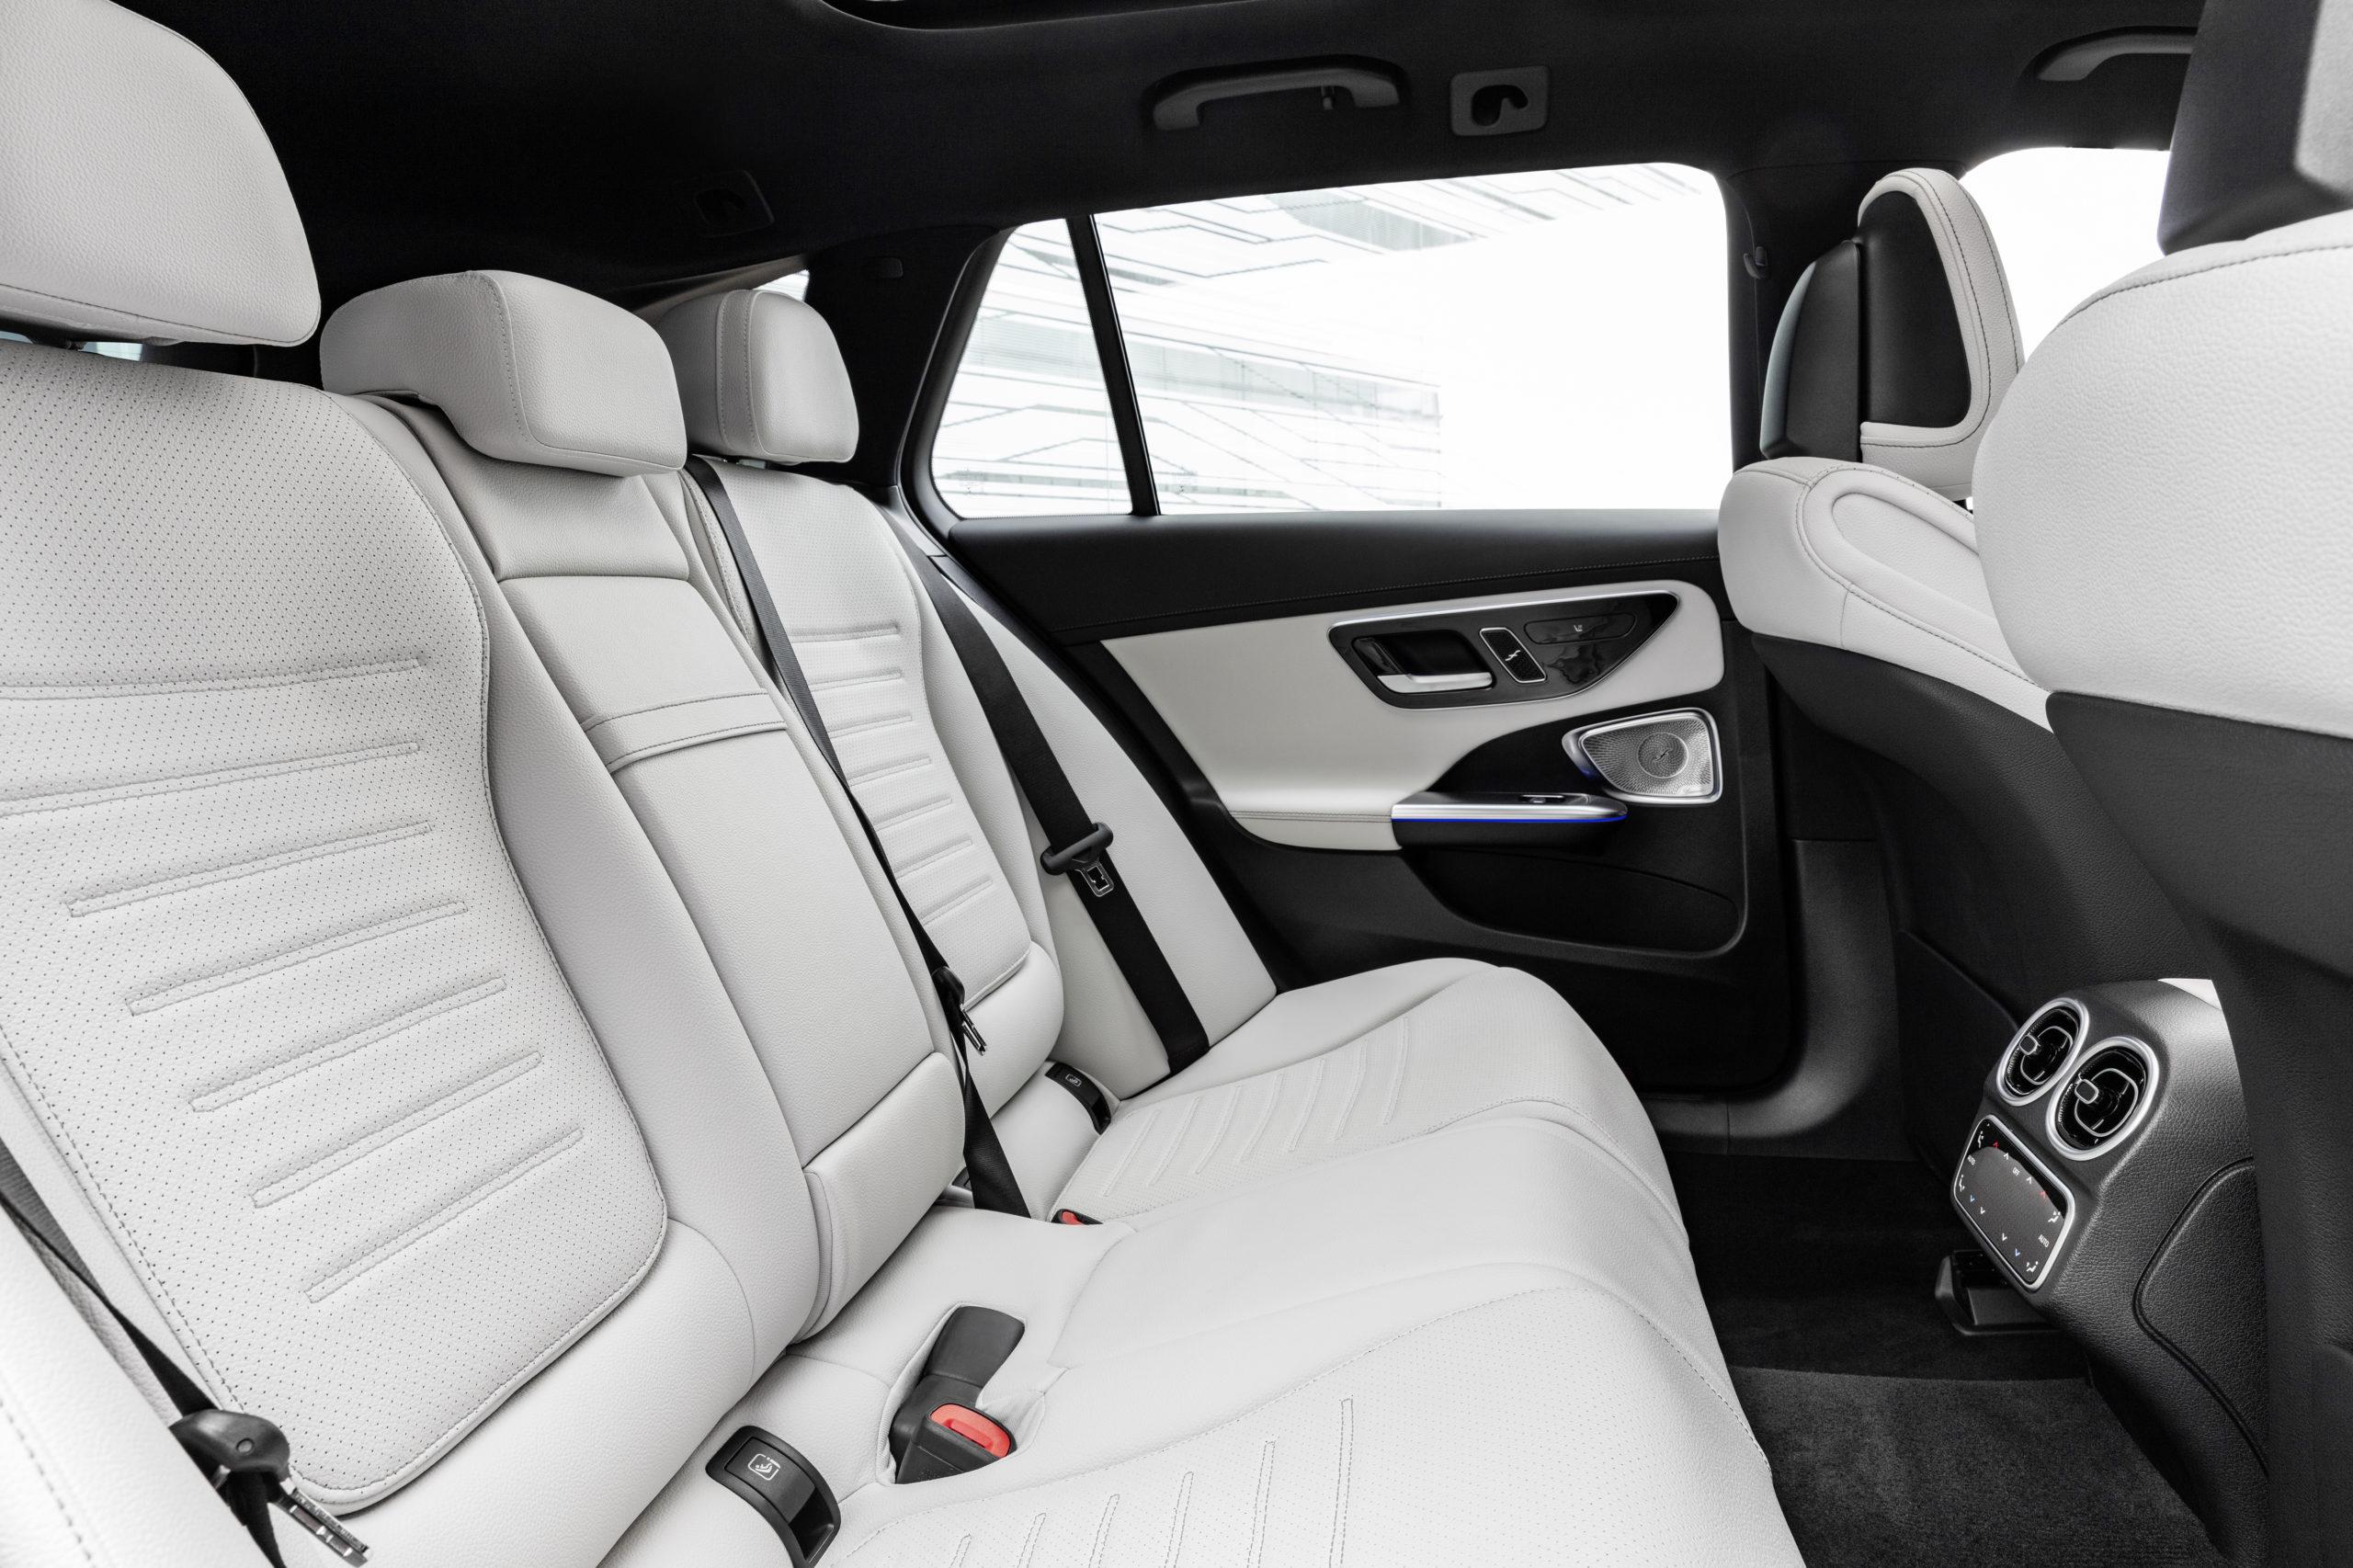 2021 Mercedes-Benz Triedy C plug-in hybrid kombi